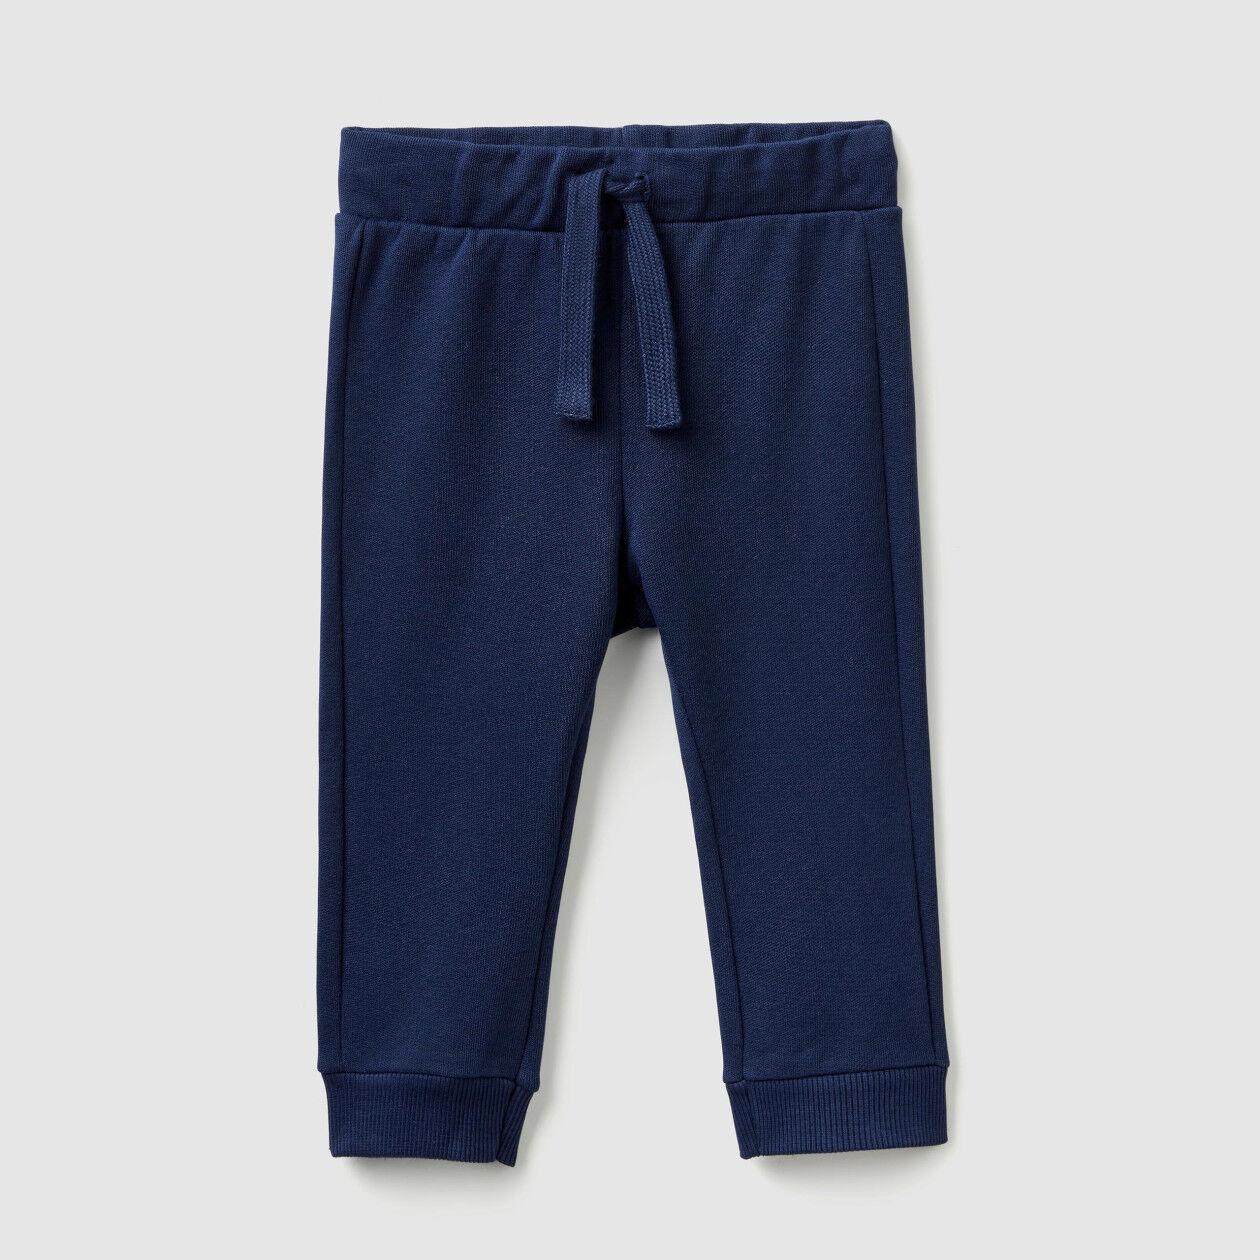 Pantalón deportivo con cordón de ajuste